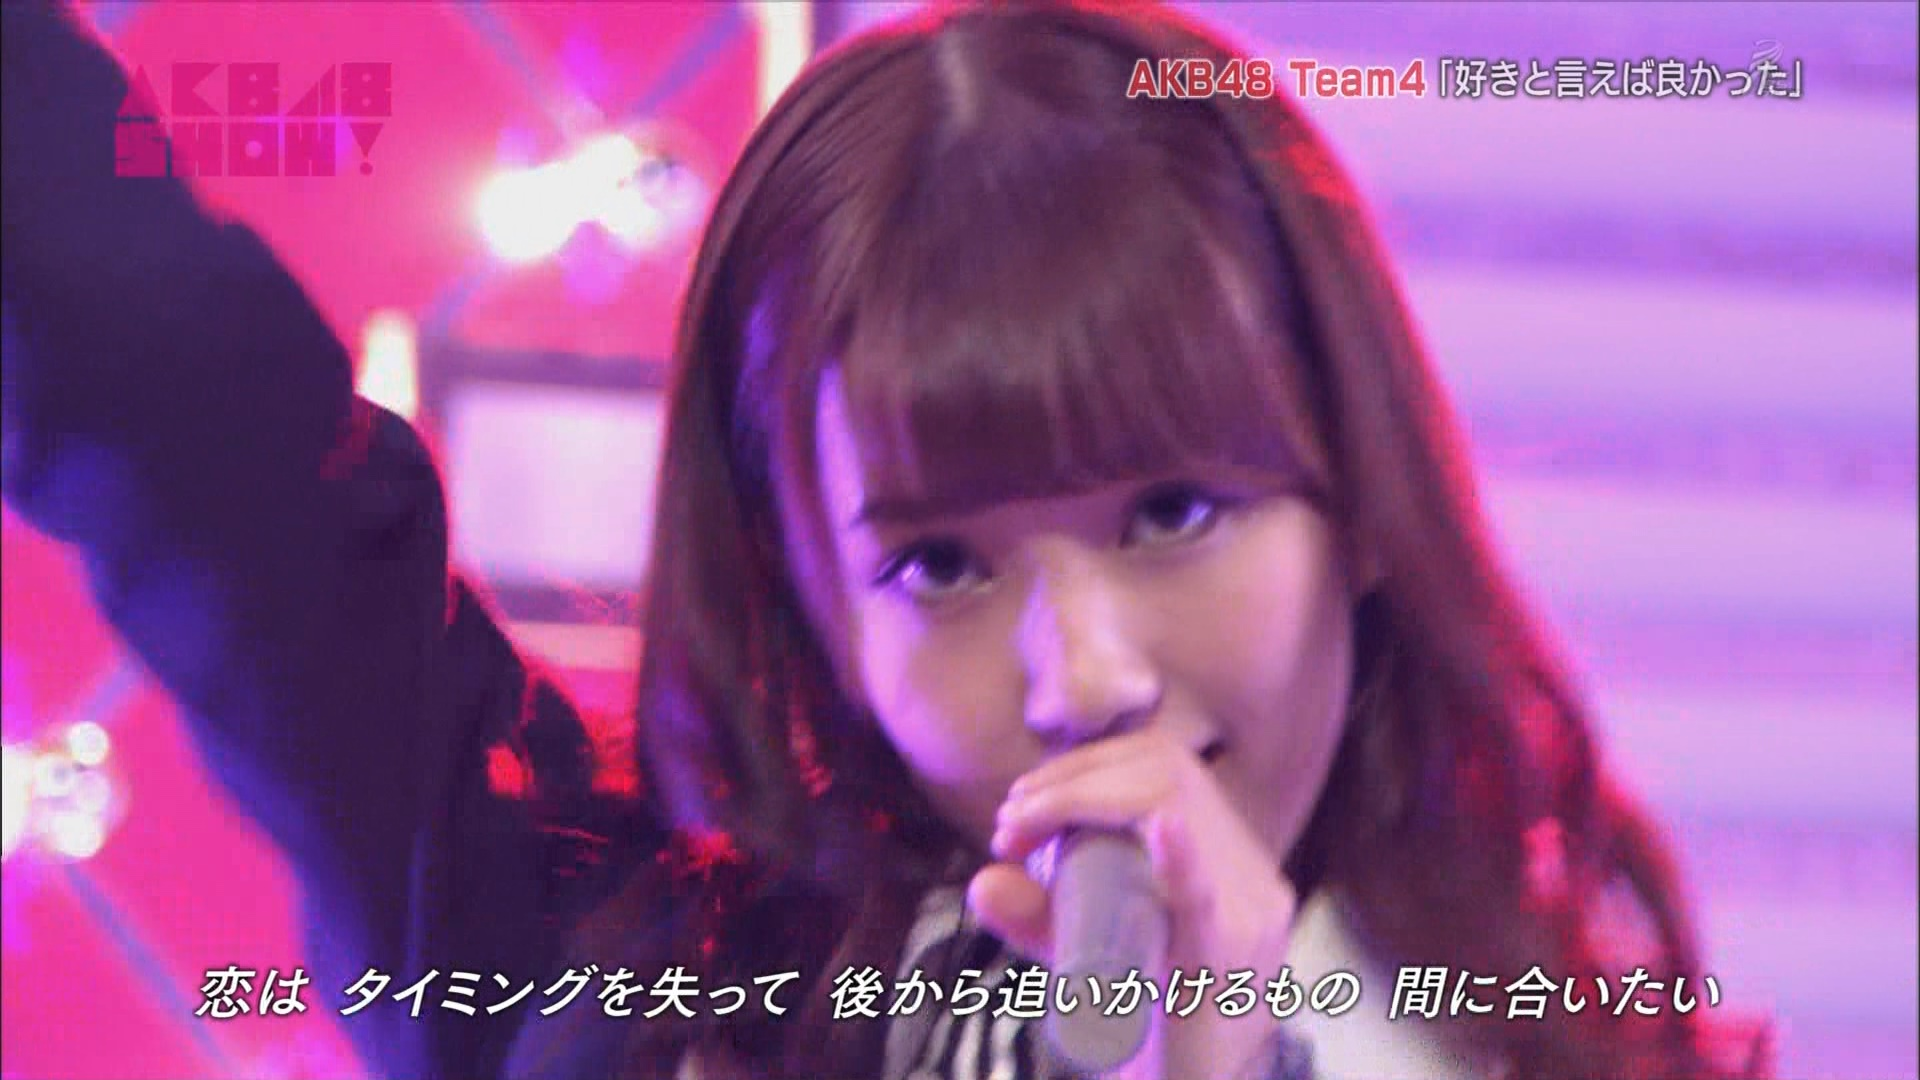 AKB48SHOW チーム4好きといえば良かった 加藤玲奈 20140830 (12)